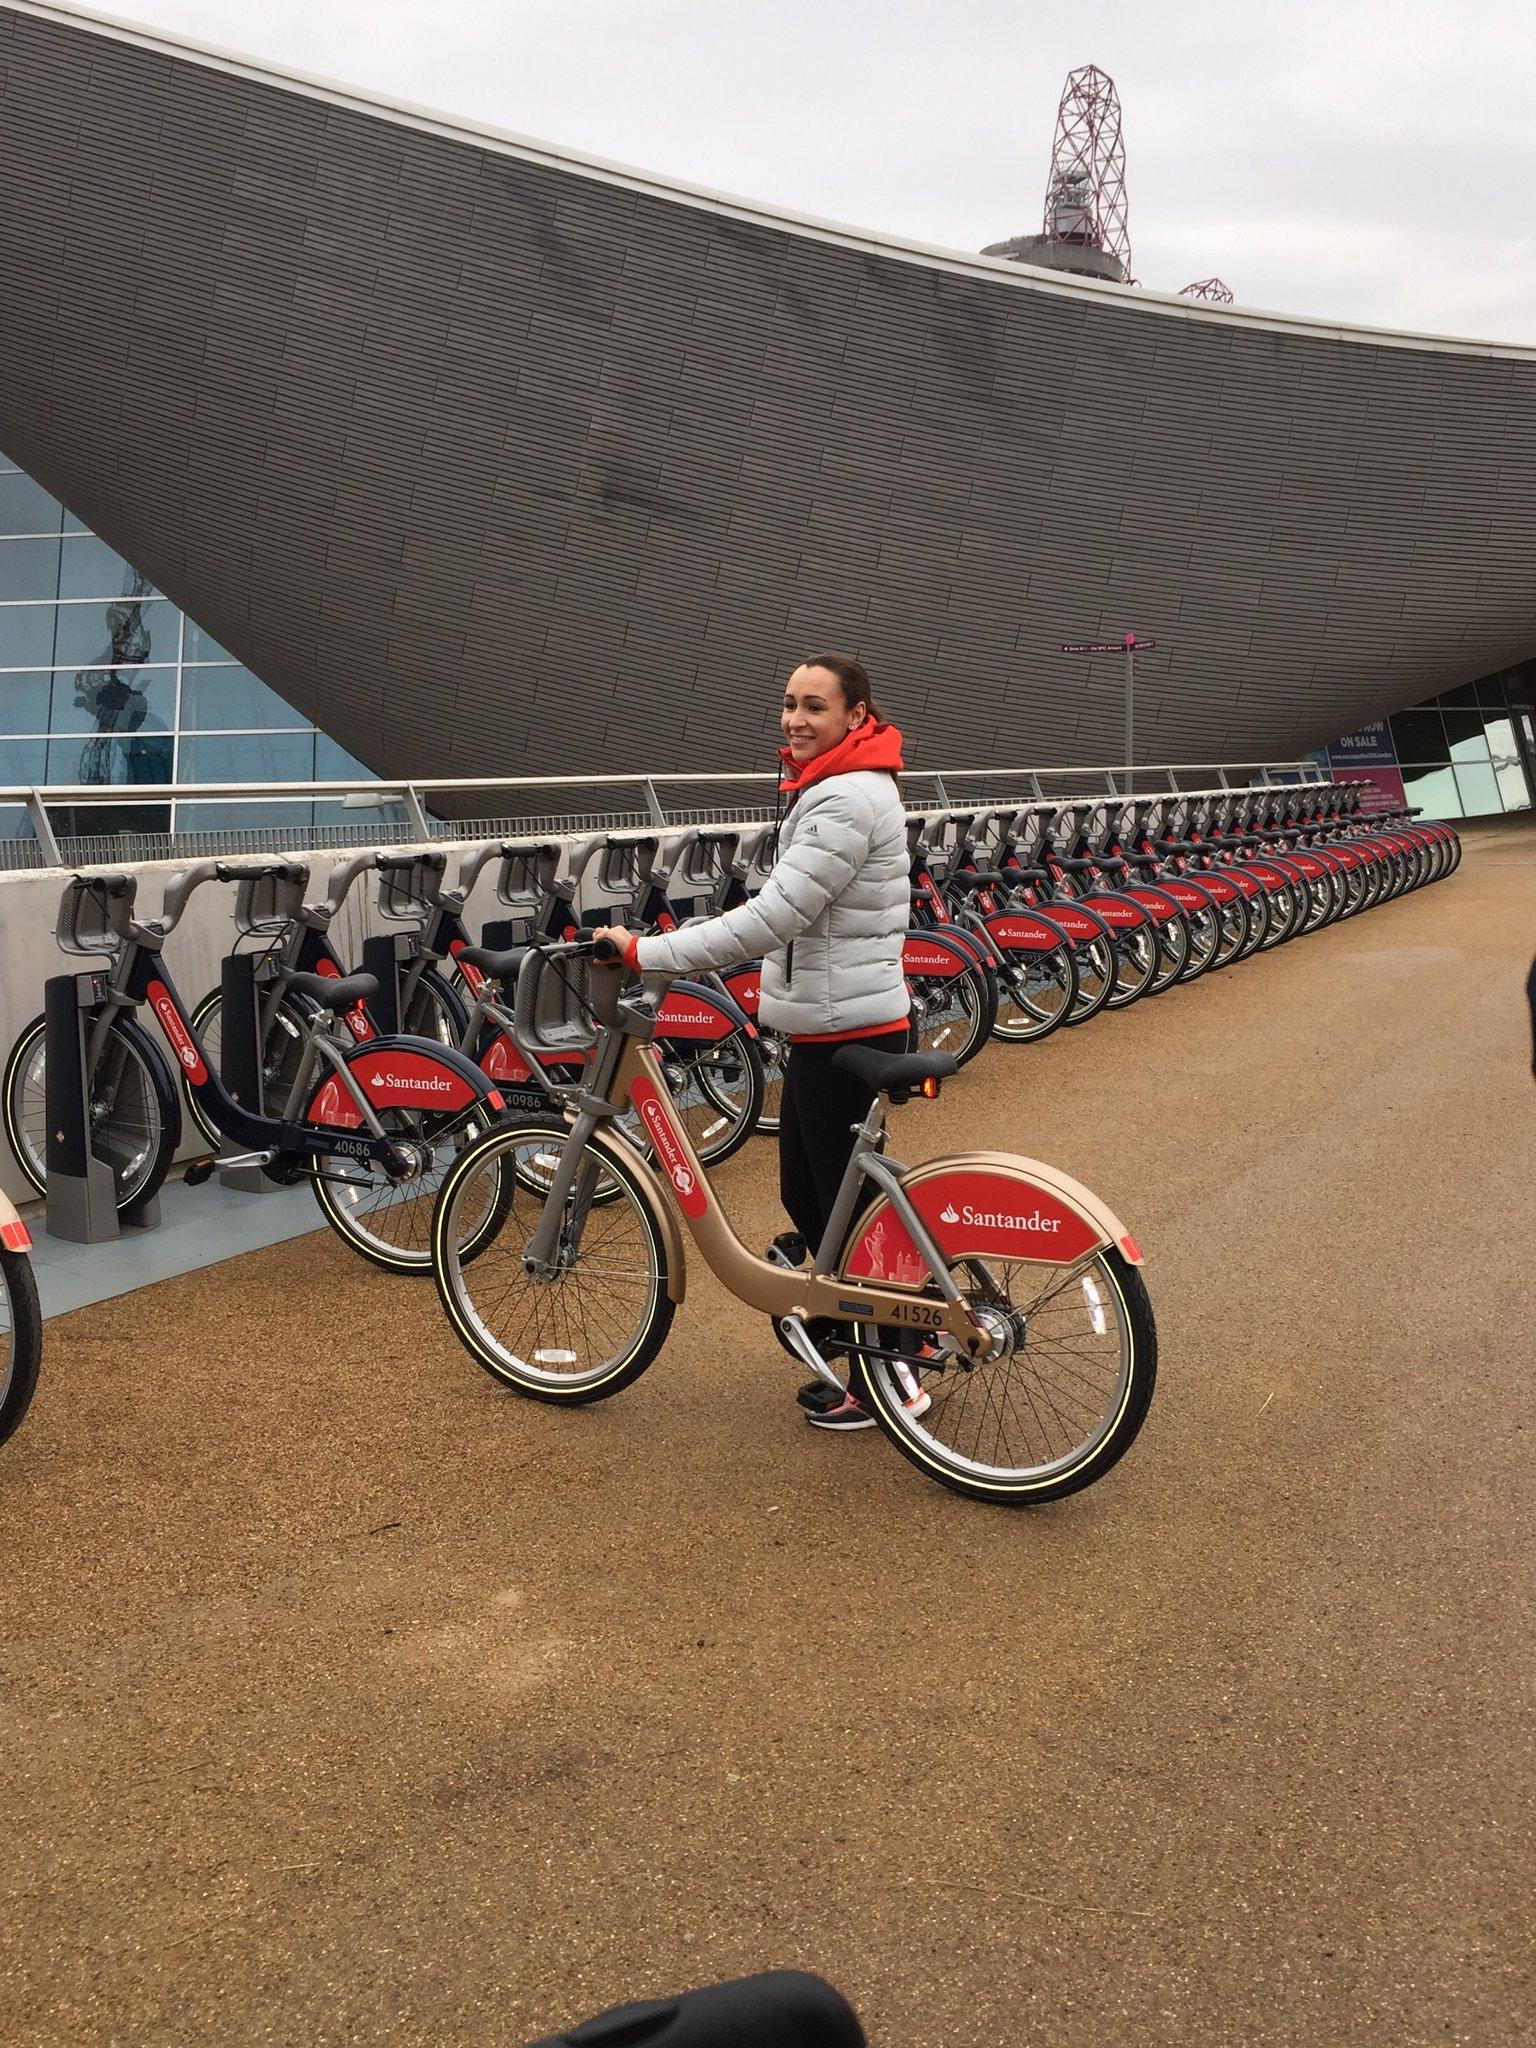 You can now follow in @J_Ennis lead & hire fantastic @SantanderCycles on @noordinarypark - https://t.co/VoziqX5Vlw https://t.co/A7yy5QDP3P